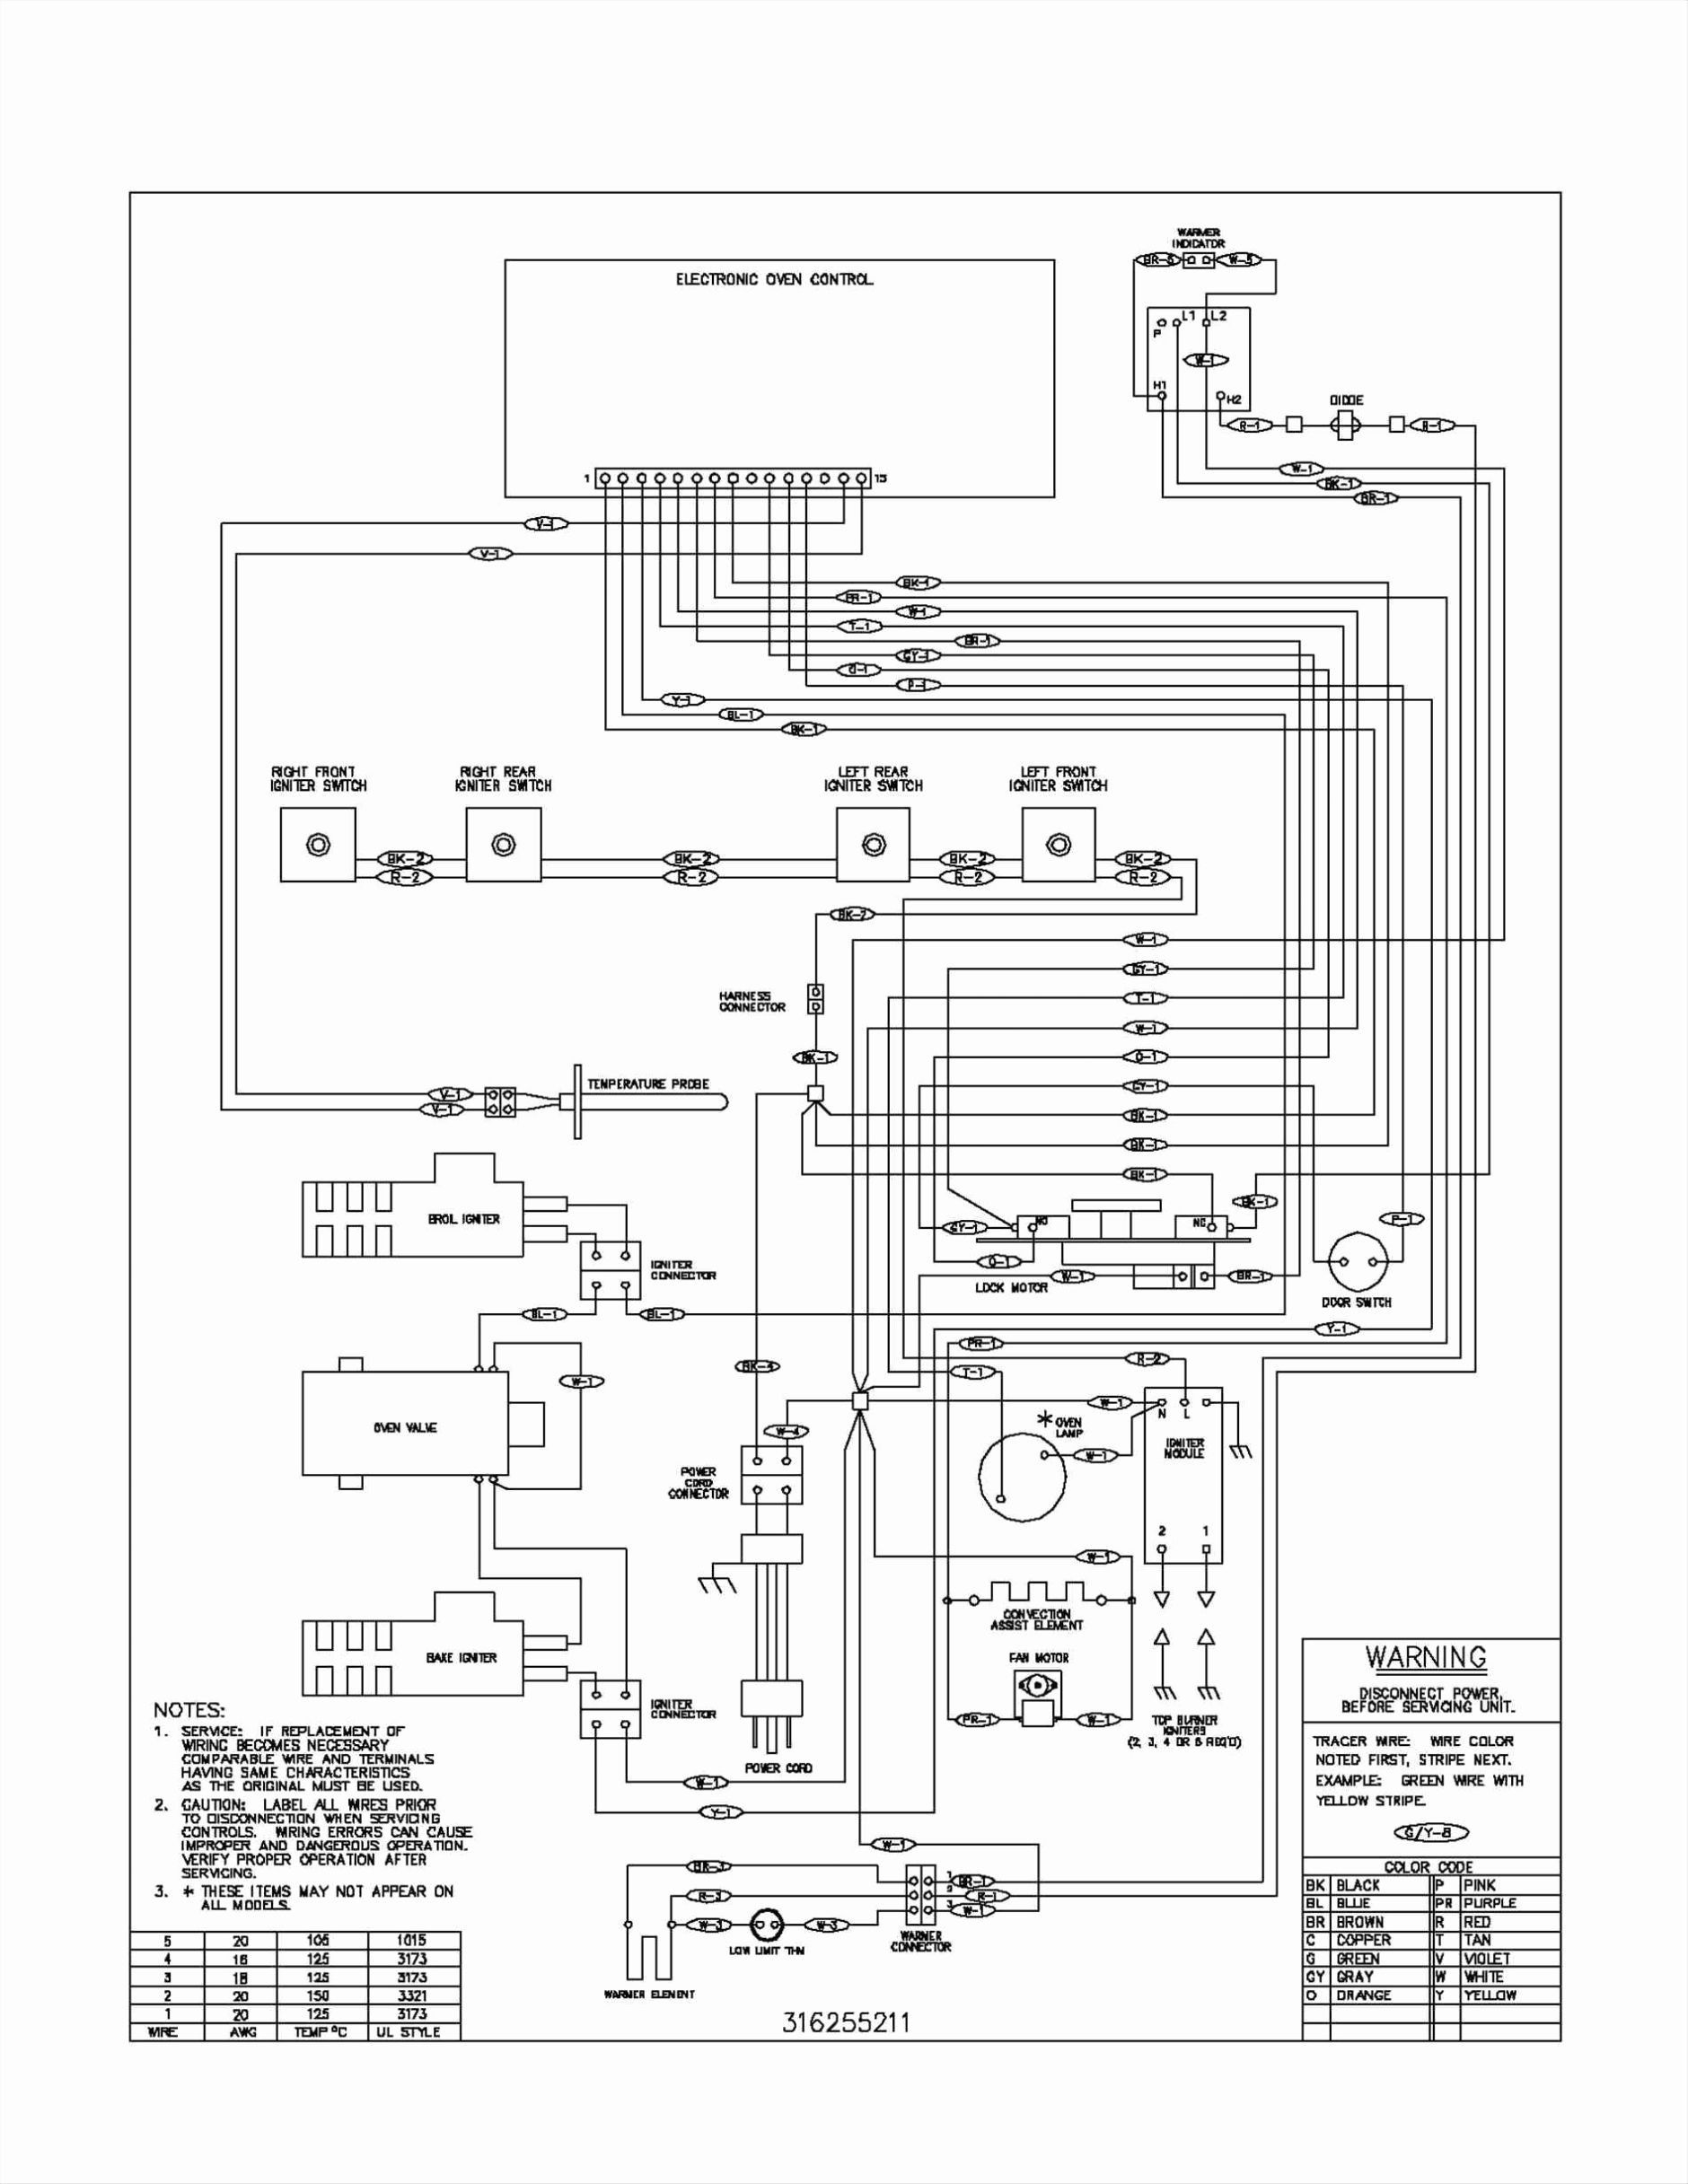 220 volt baseboard heater wiring diagram [ 1880 x 2433 Pixel ]